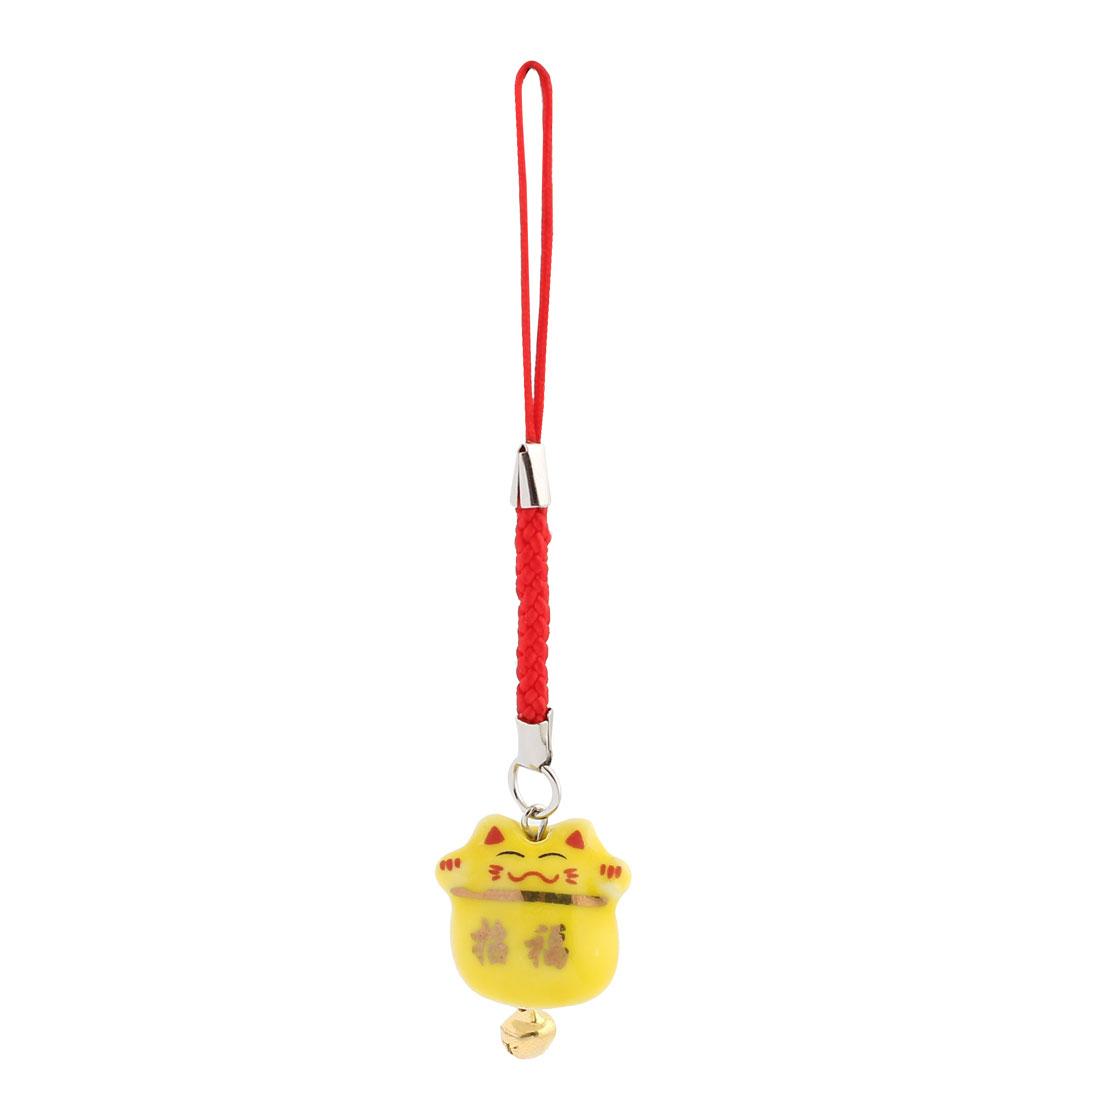 Ceramic Maneki Neko Tinkle Bell Pendant Mobile Phone Strap Decor 95mm Length Yellow